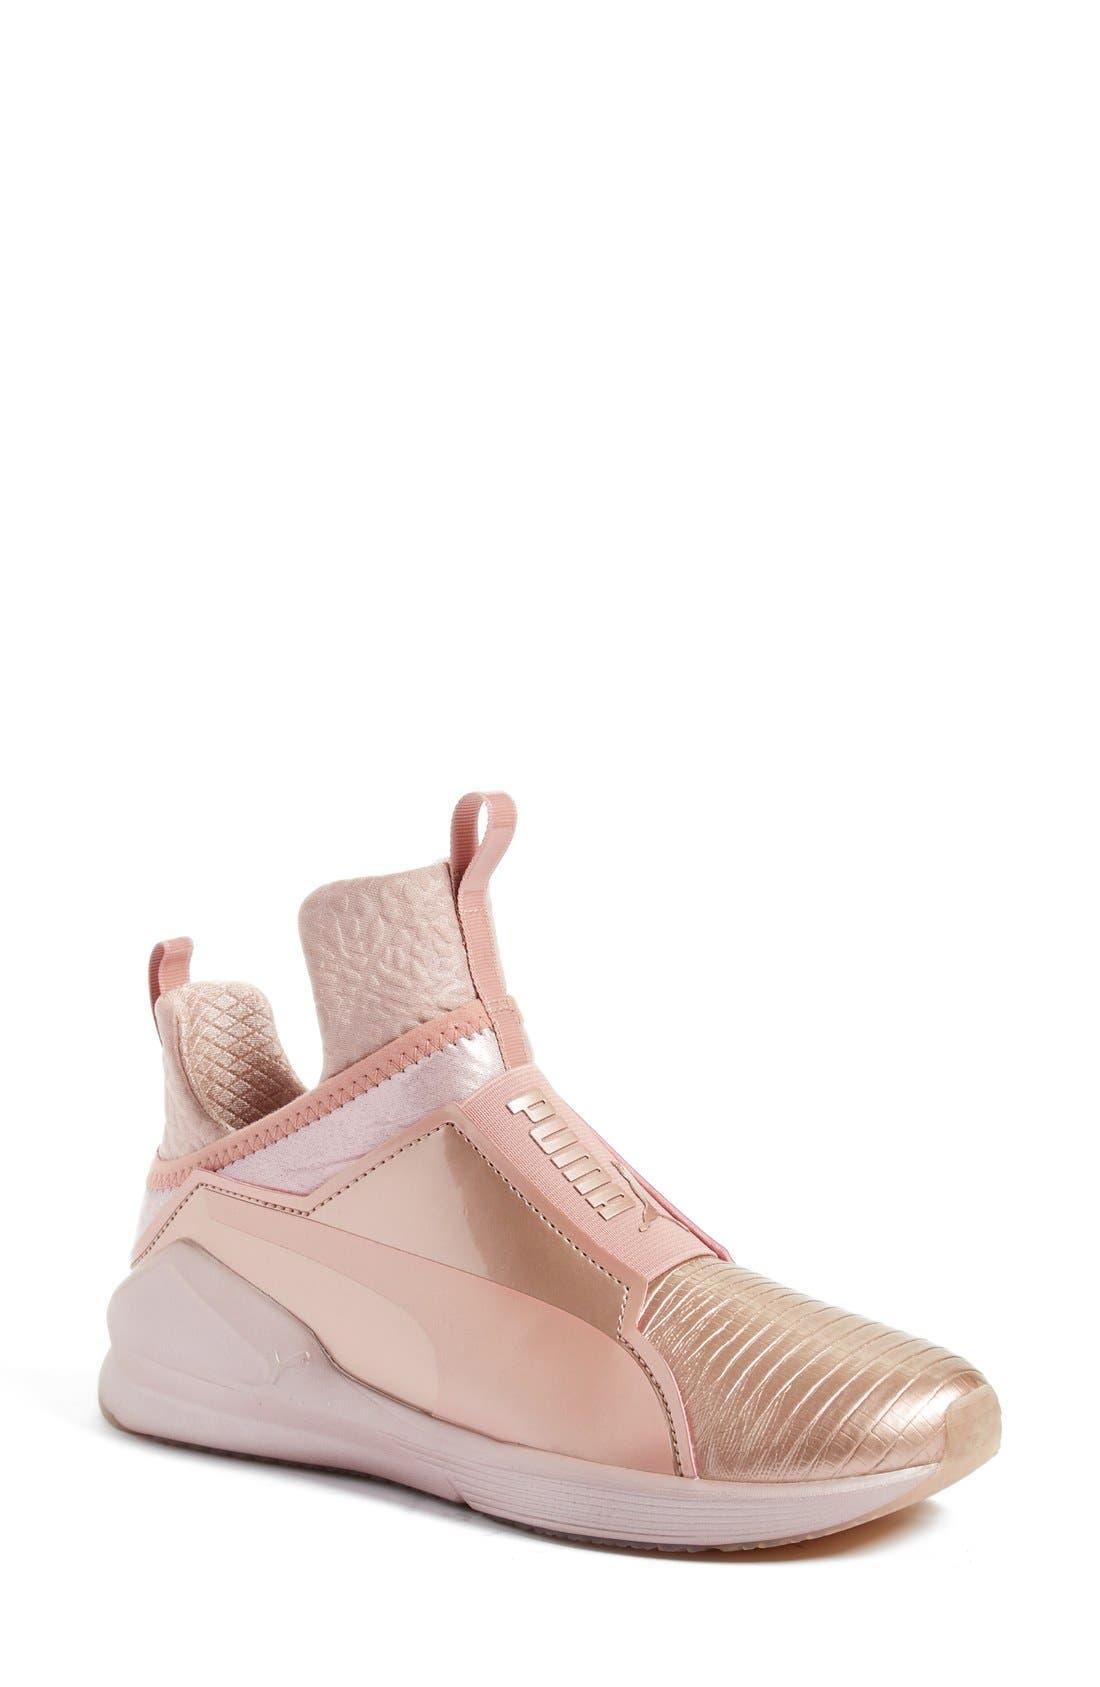 Alternate Image 1 Selected - PUMA Fierce Metallic High Top Sneaker (Women)